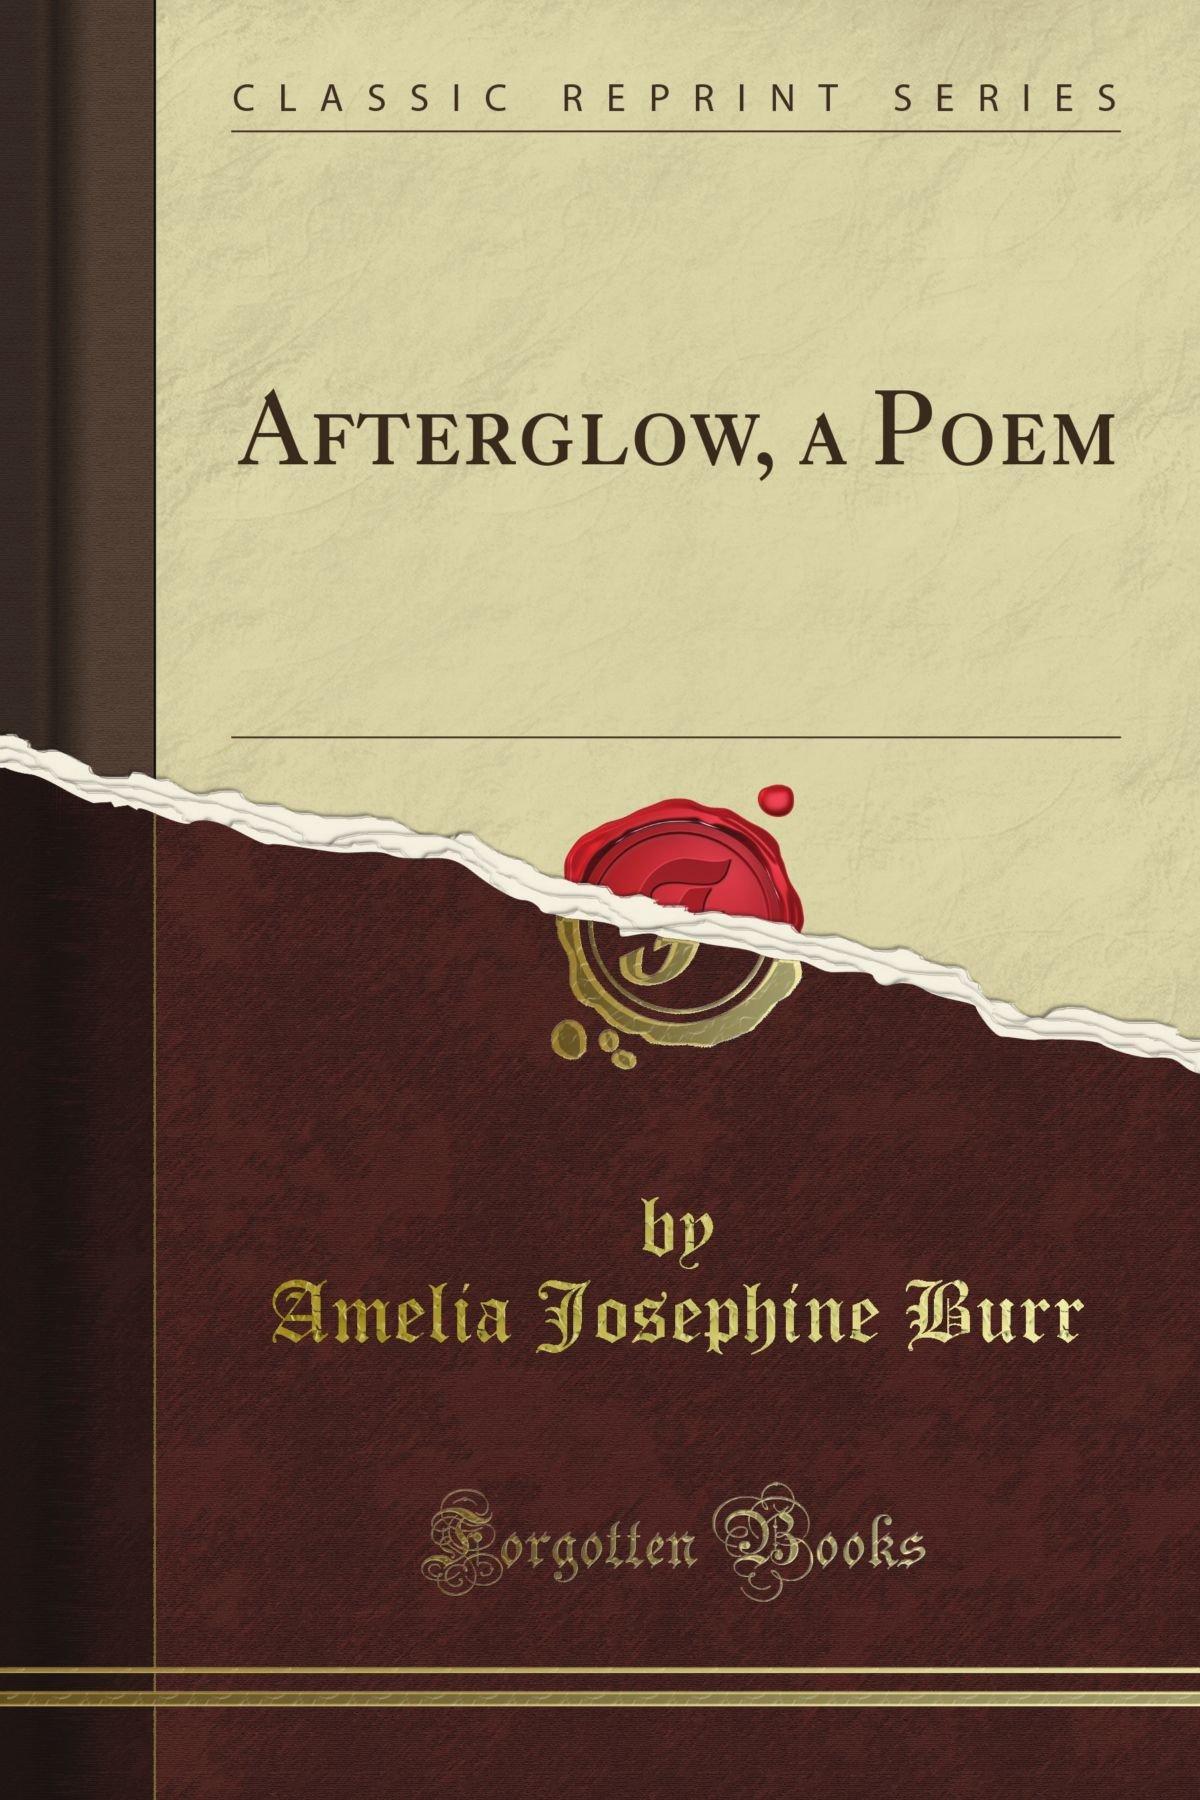 Afterglow, a Poem (Classic Reprint): Amelia Josephine Burr